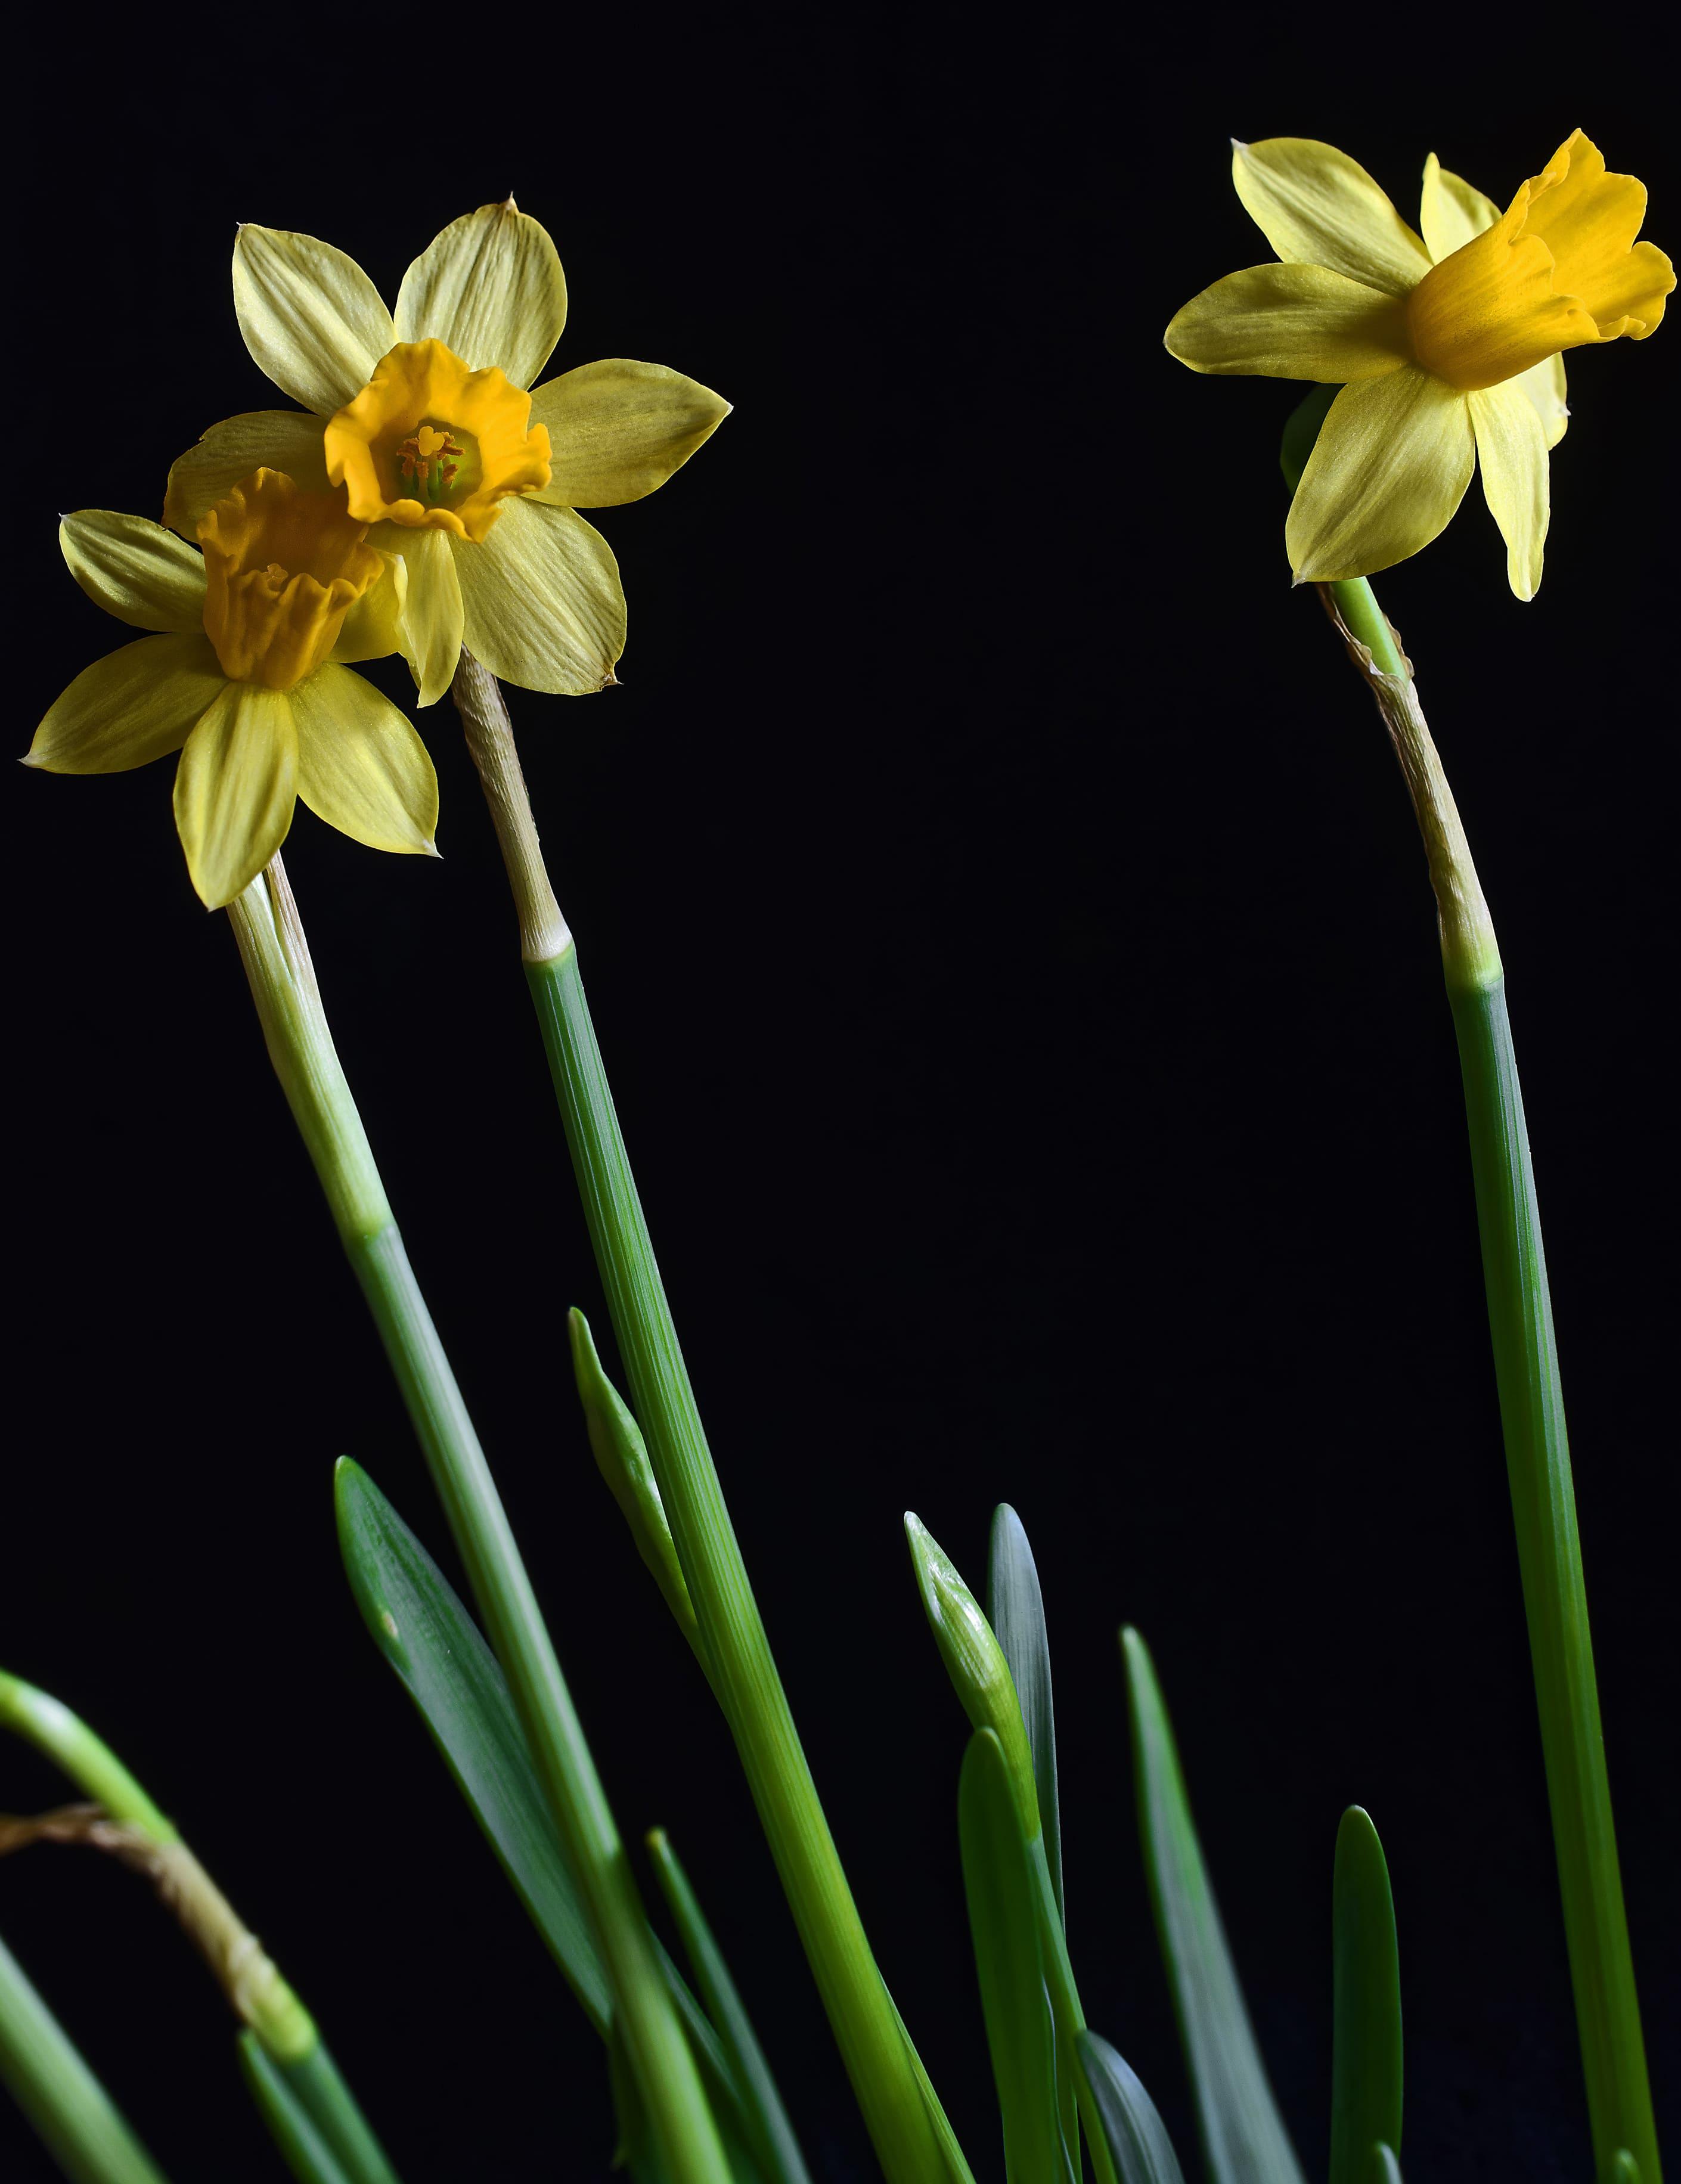 daffodils-photo-40